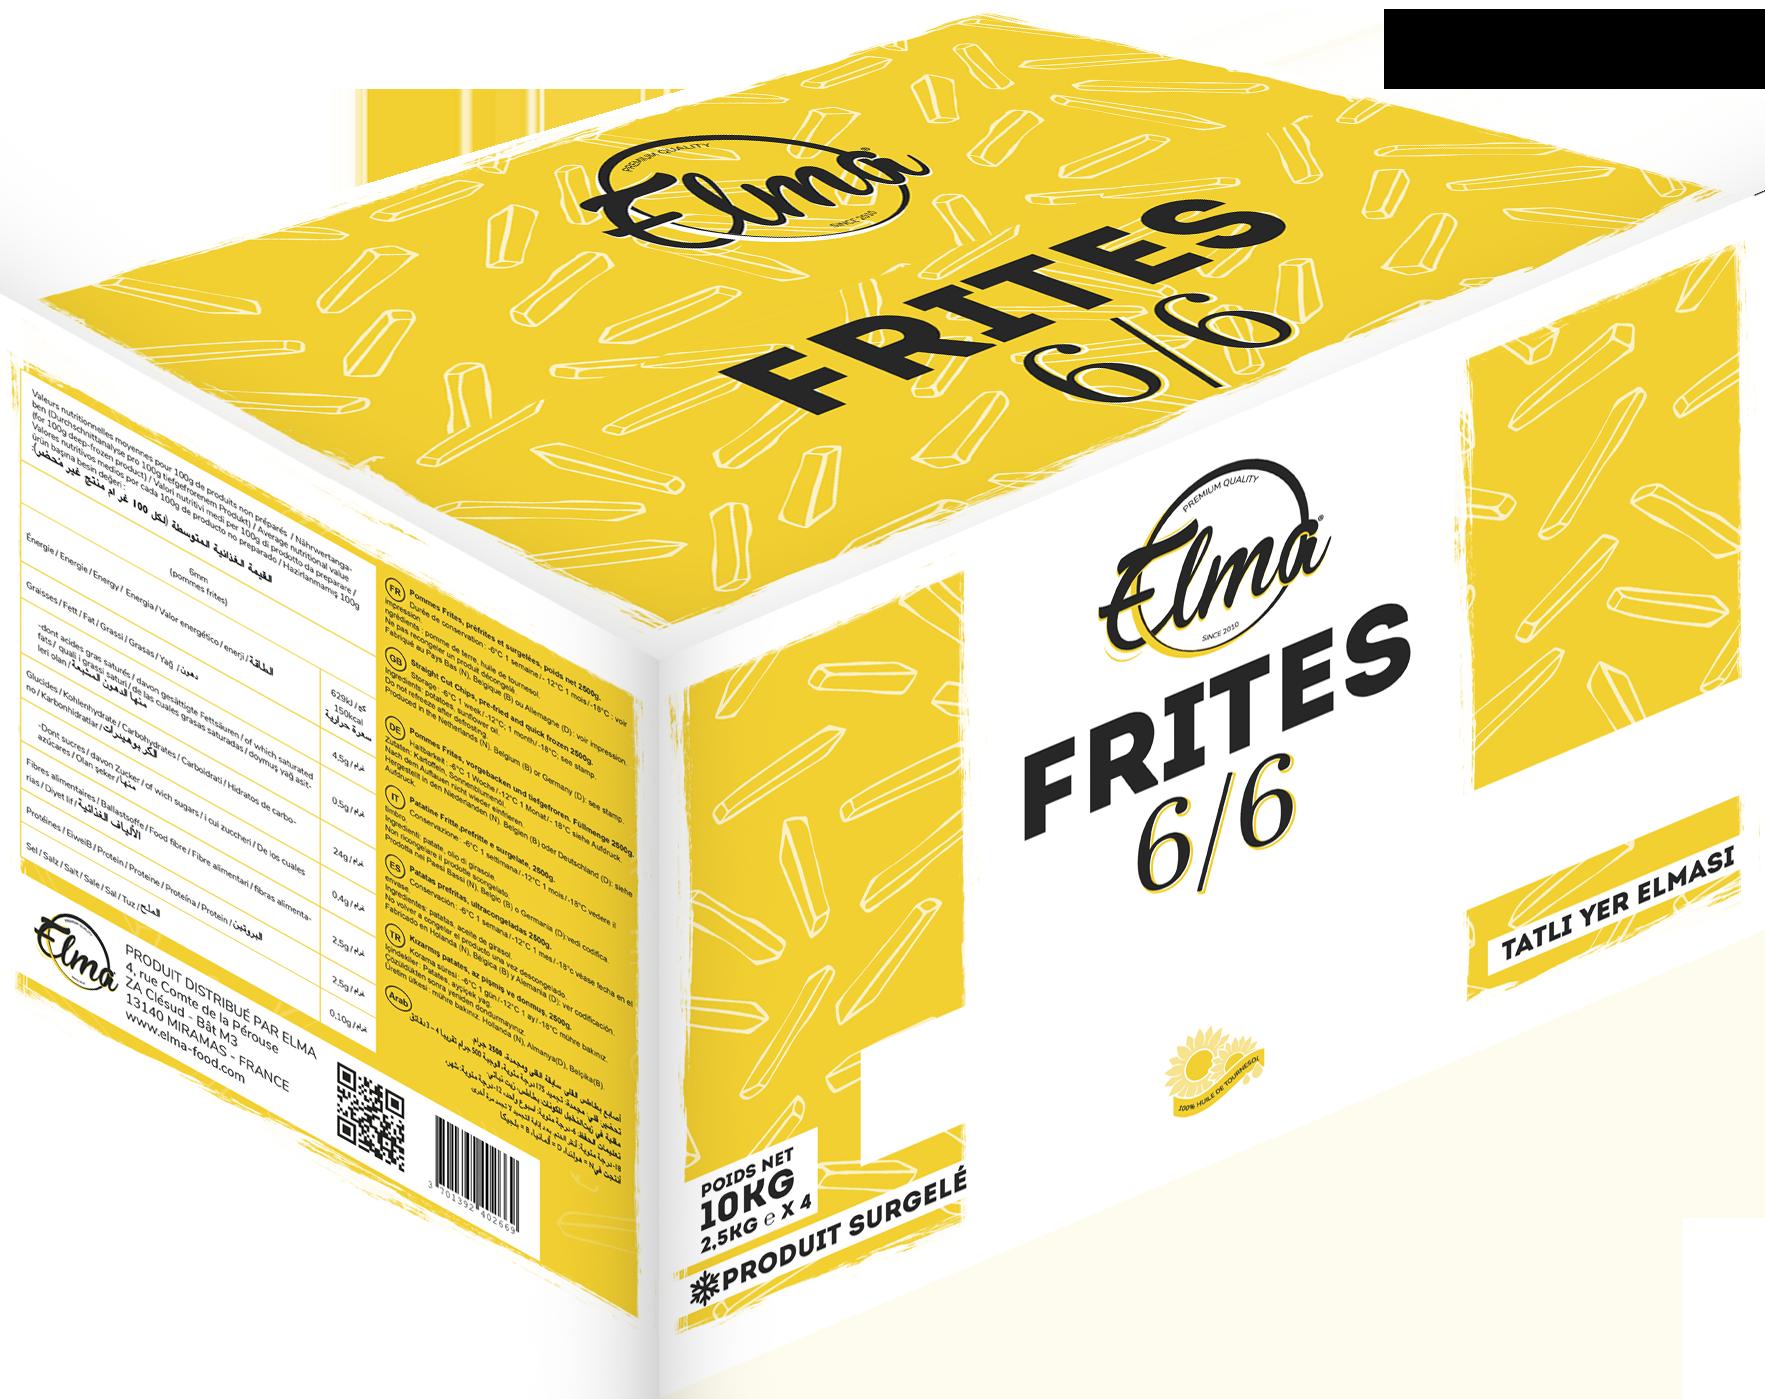 Elma-carton-frites-6/6